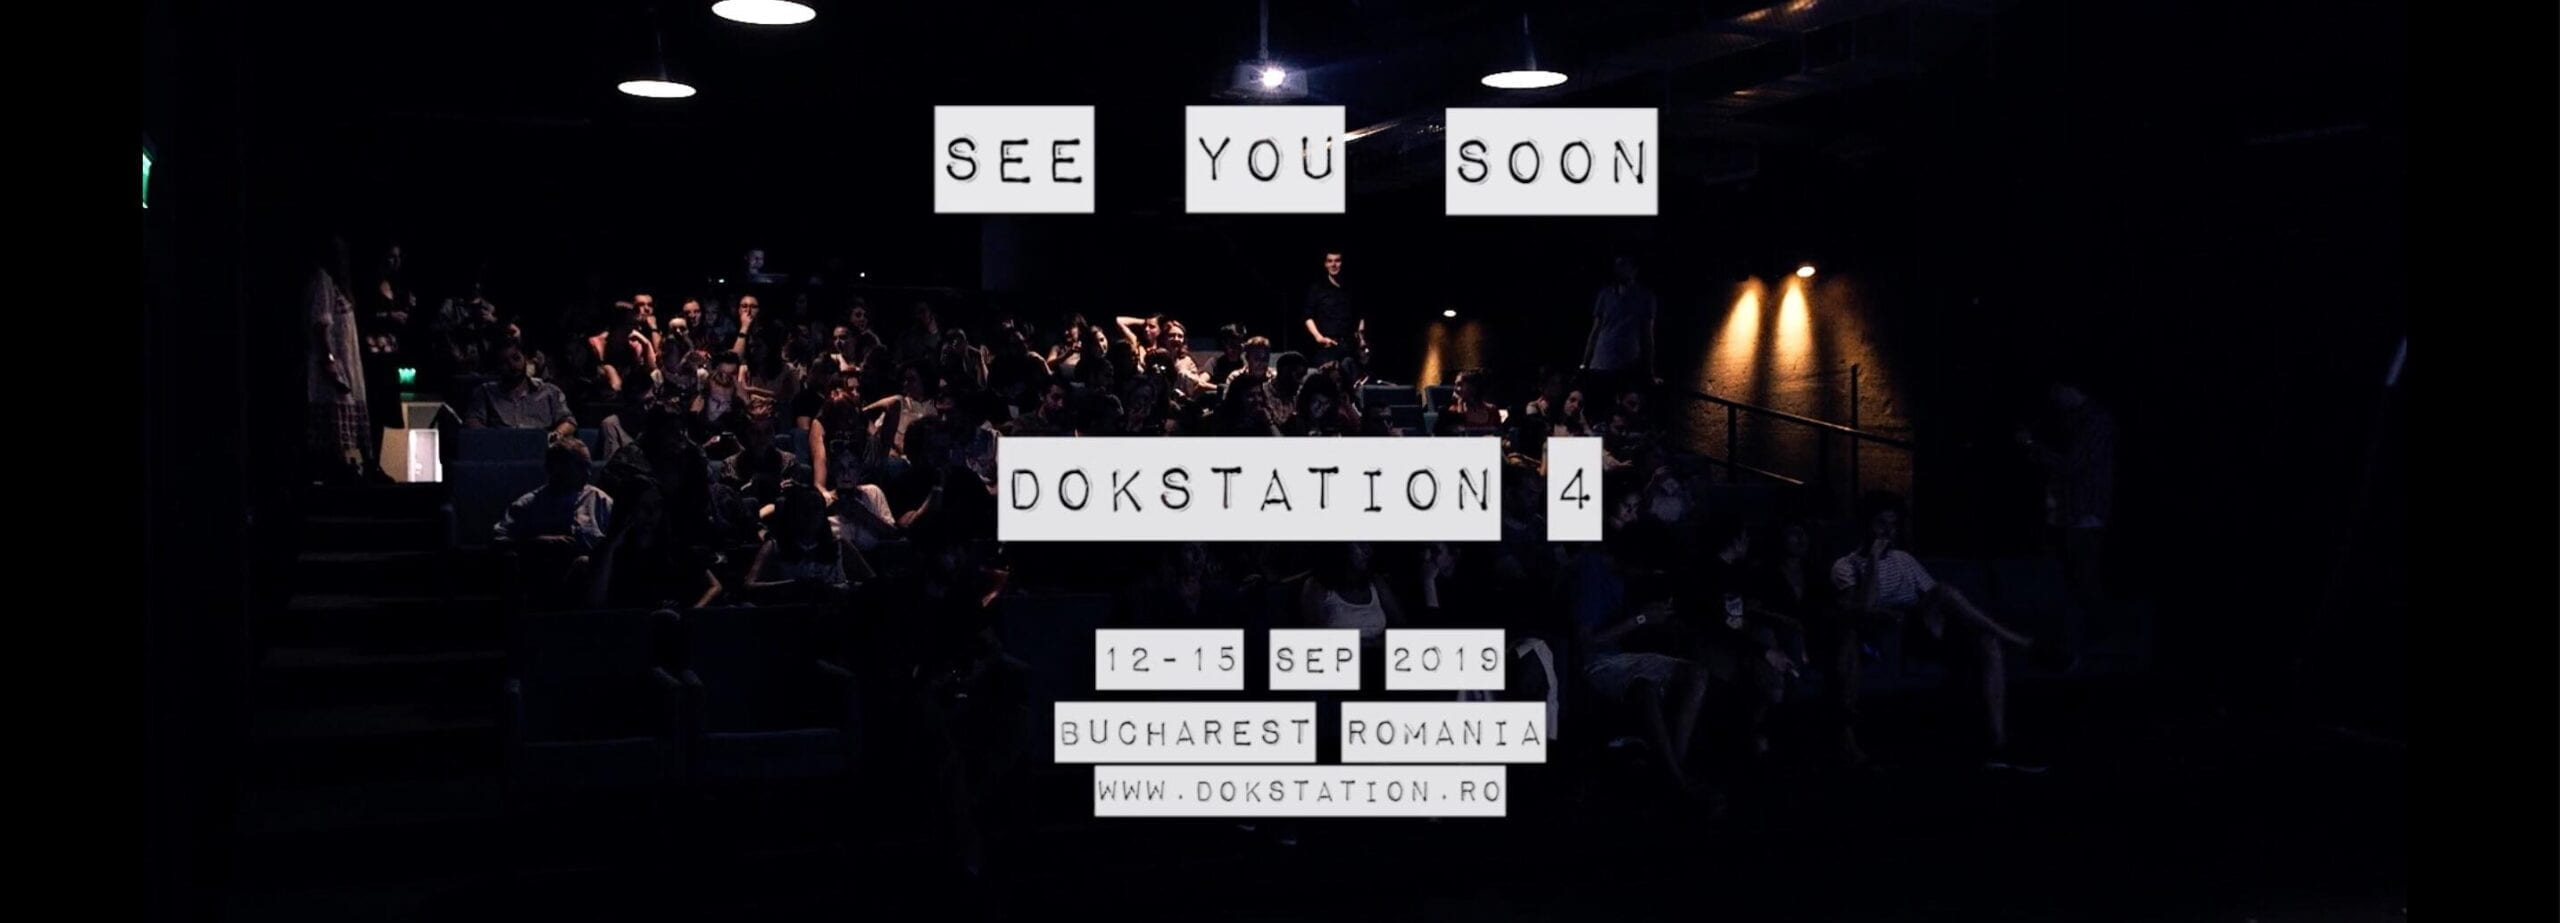 Dokstation: 4th Edition